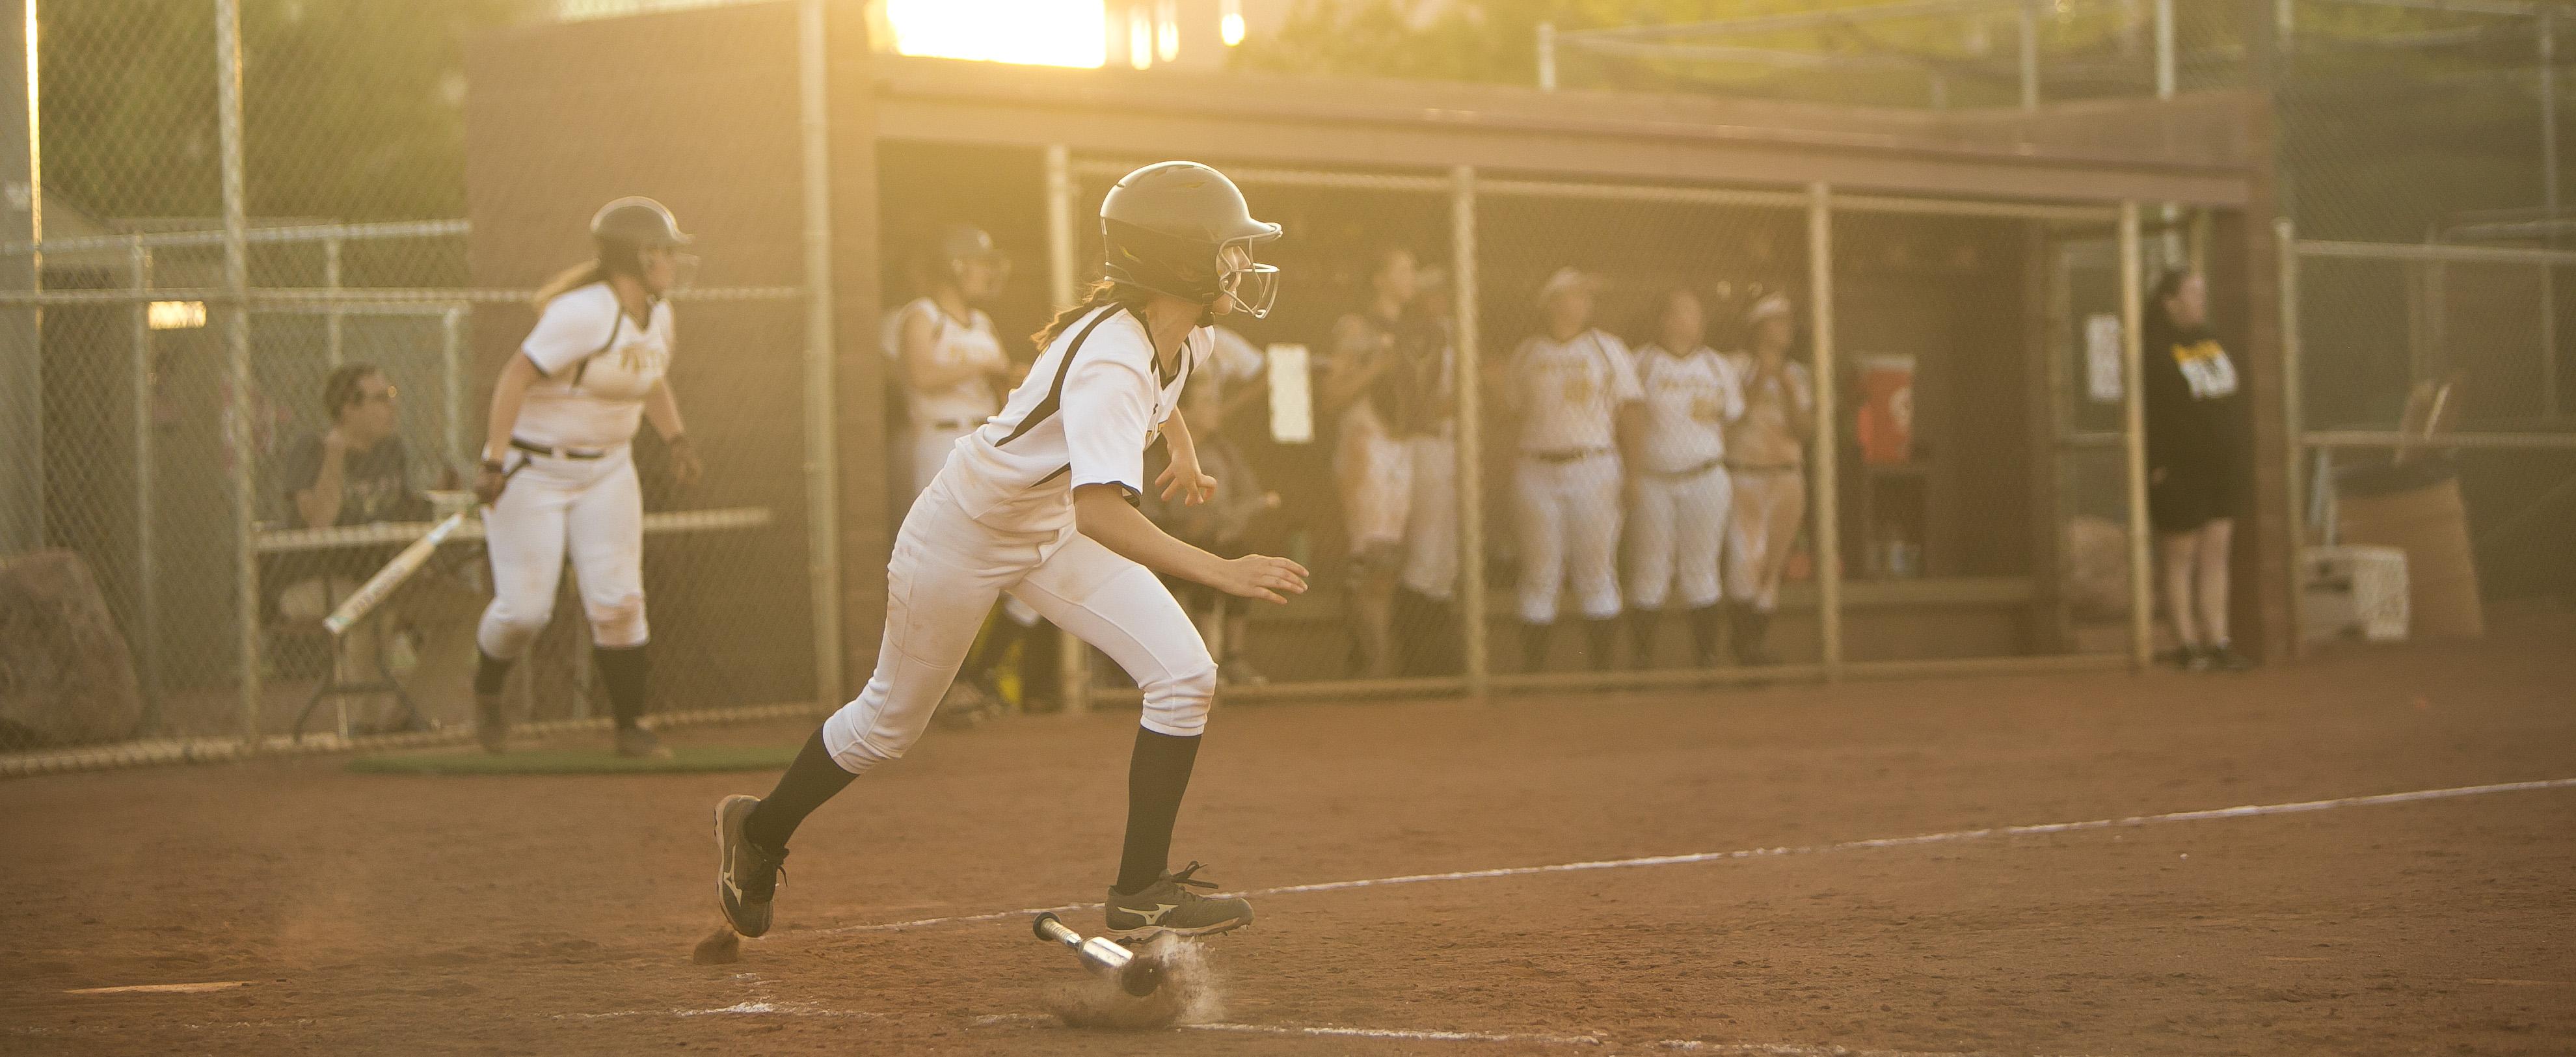 Softball_146-1.jpg